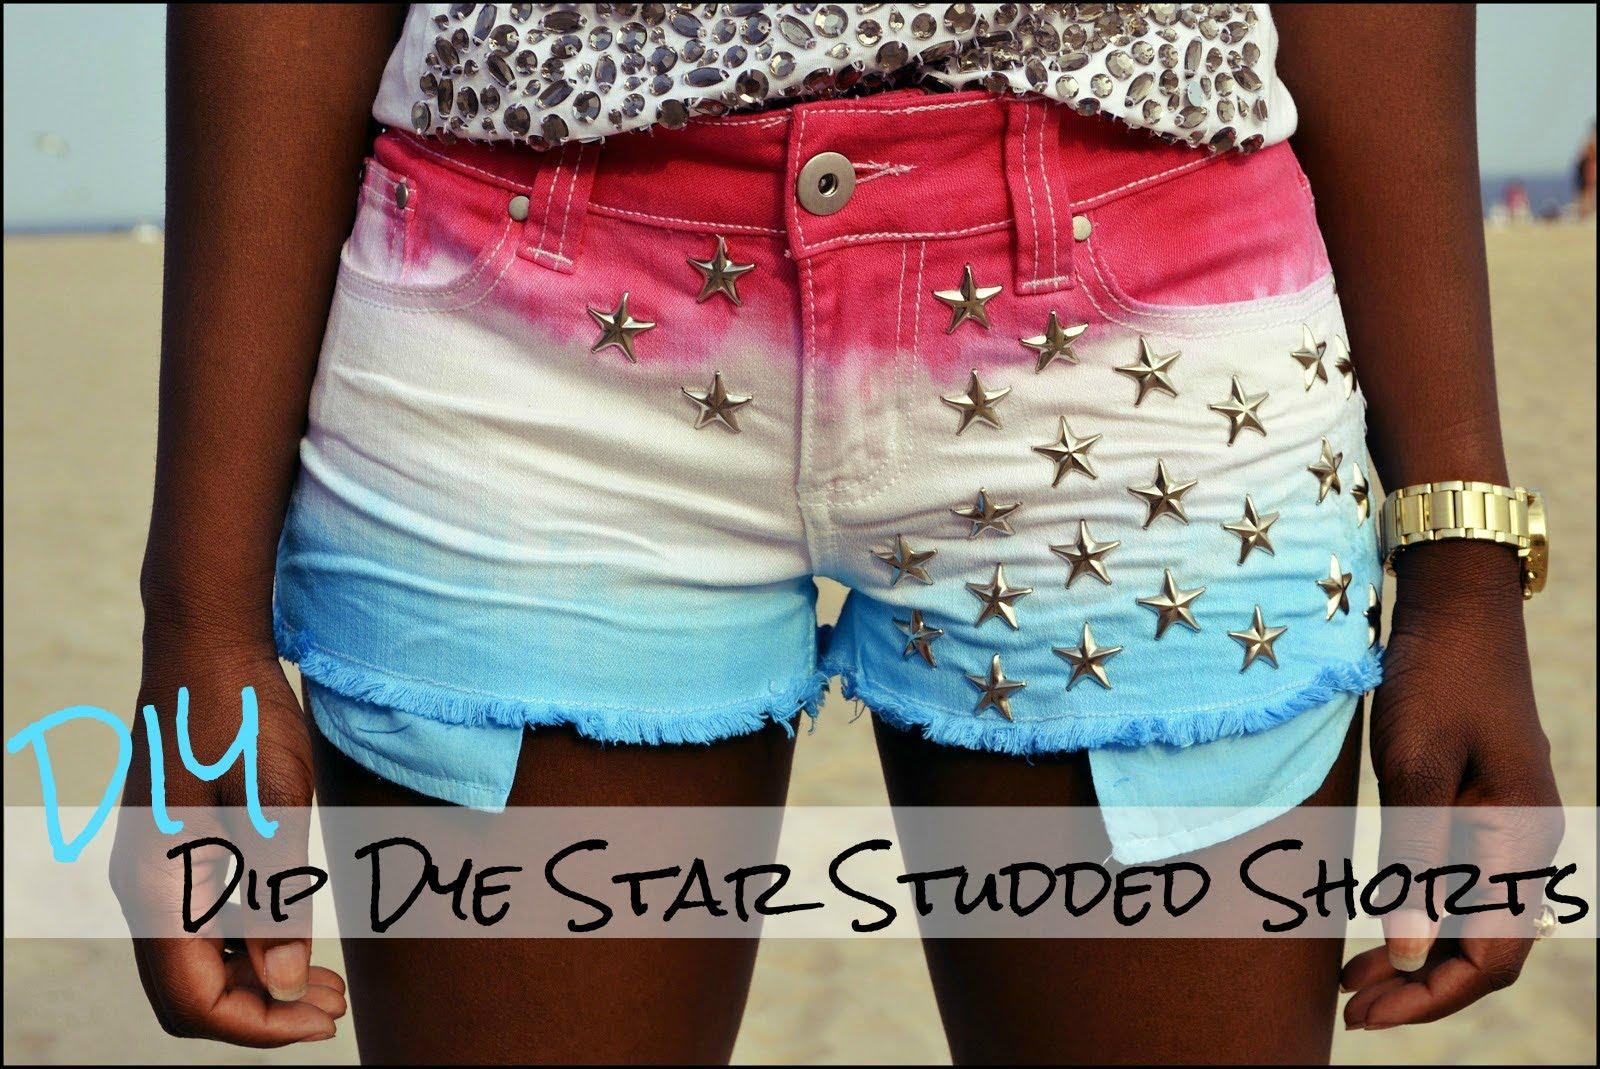 DIY Dip Dye Star Studded Shorts - YouTube